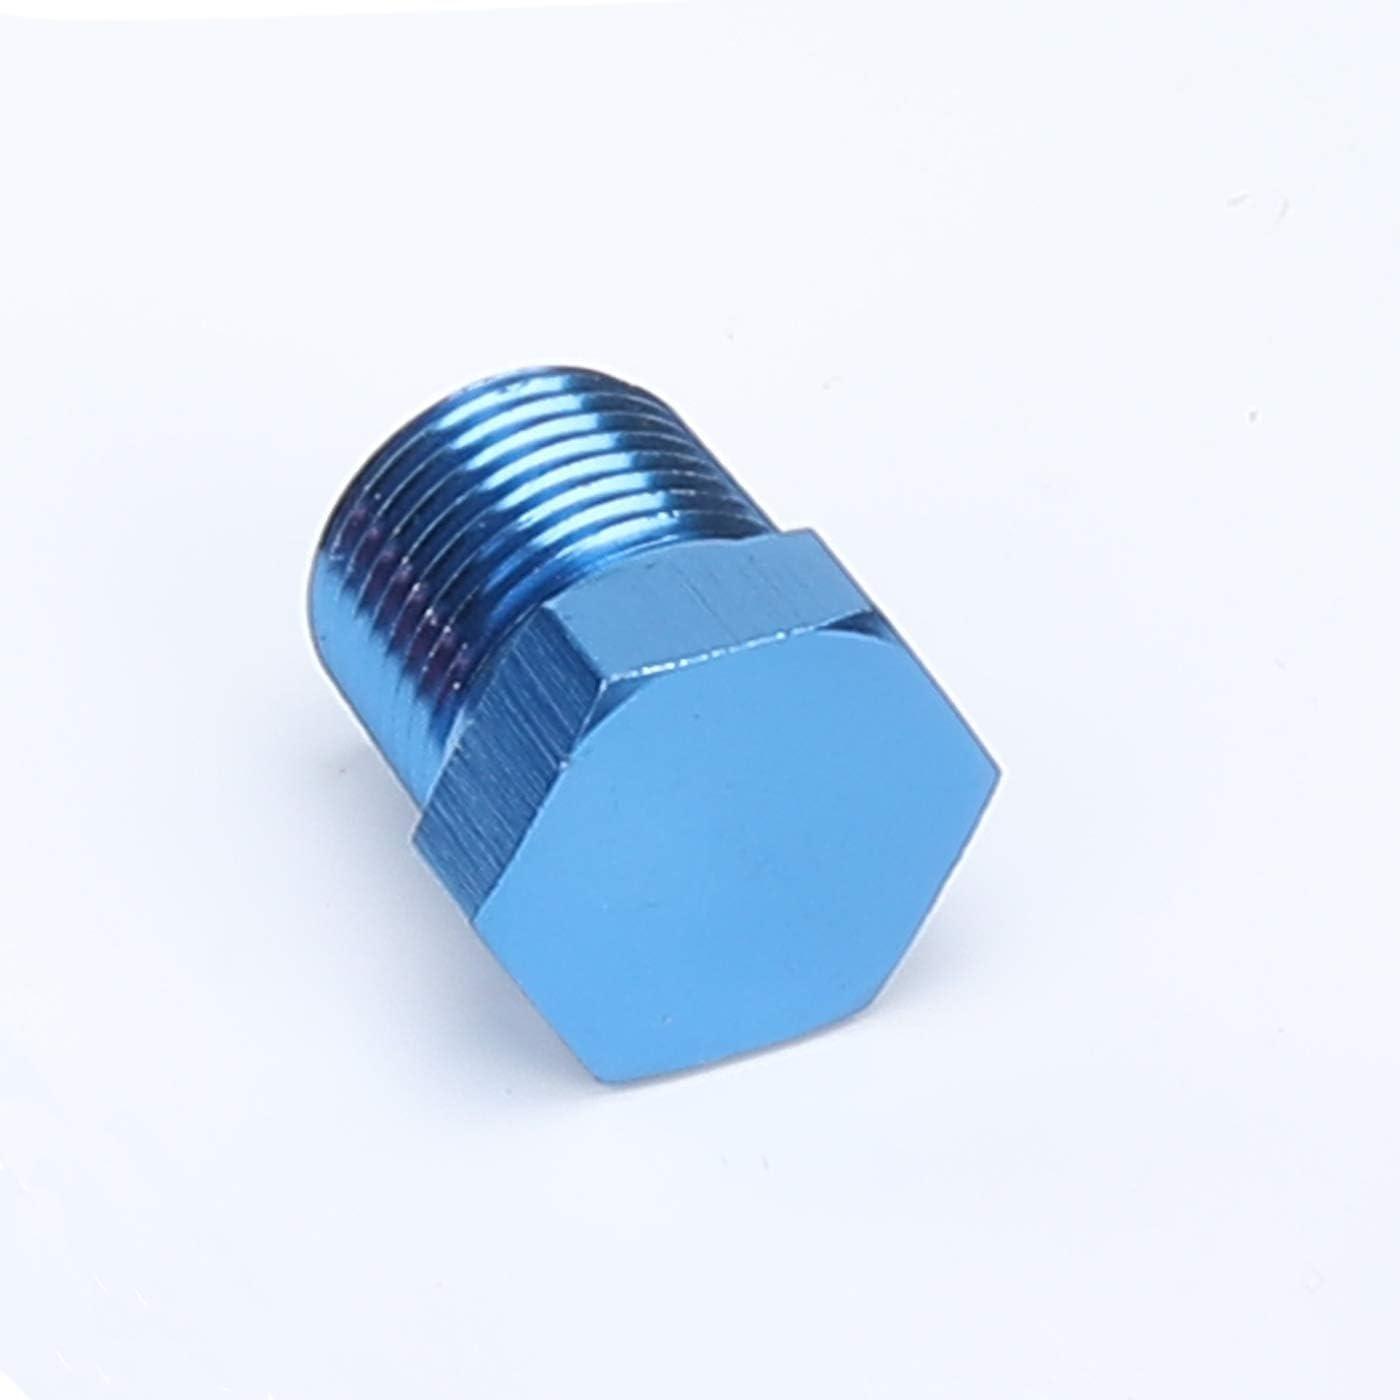 Blue Female 1//8 NPT to AN3 Male Thread Expand Adaptor Aluminum Female 1//8 NPT to 3 AN Male Expander